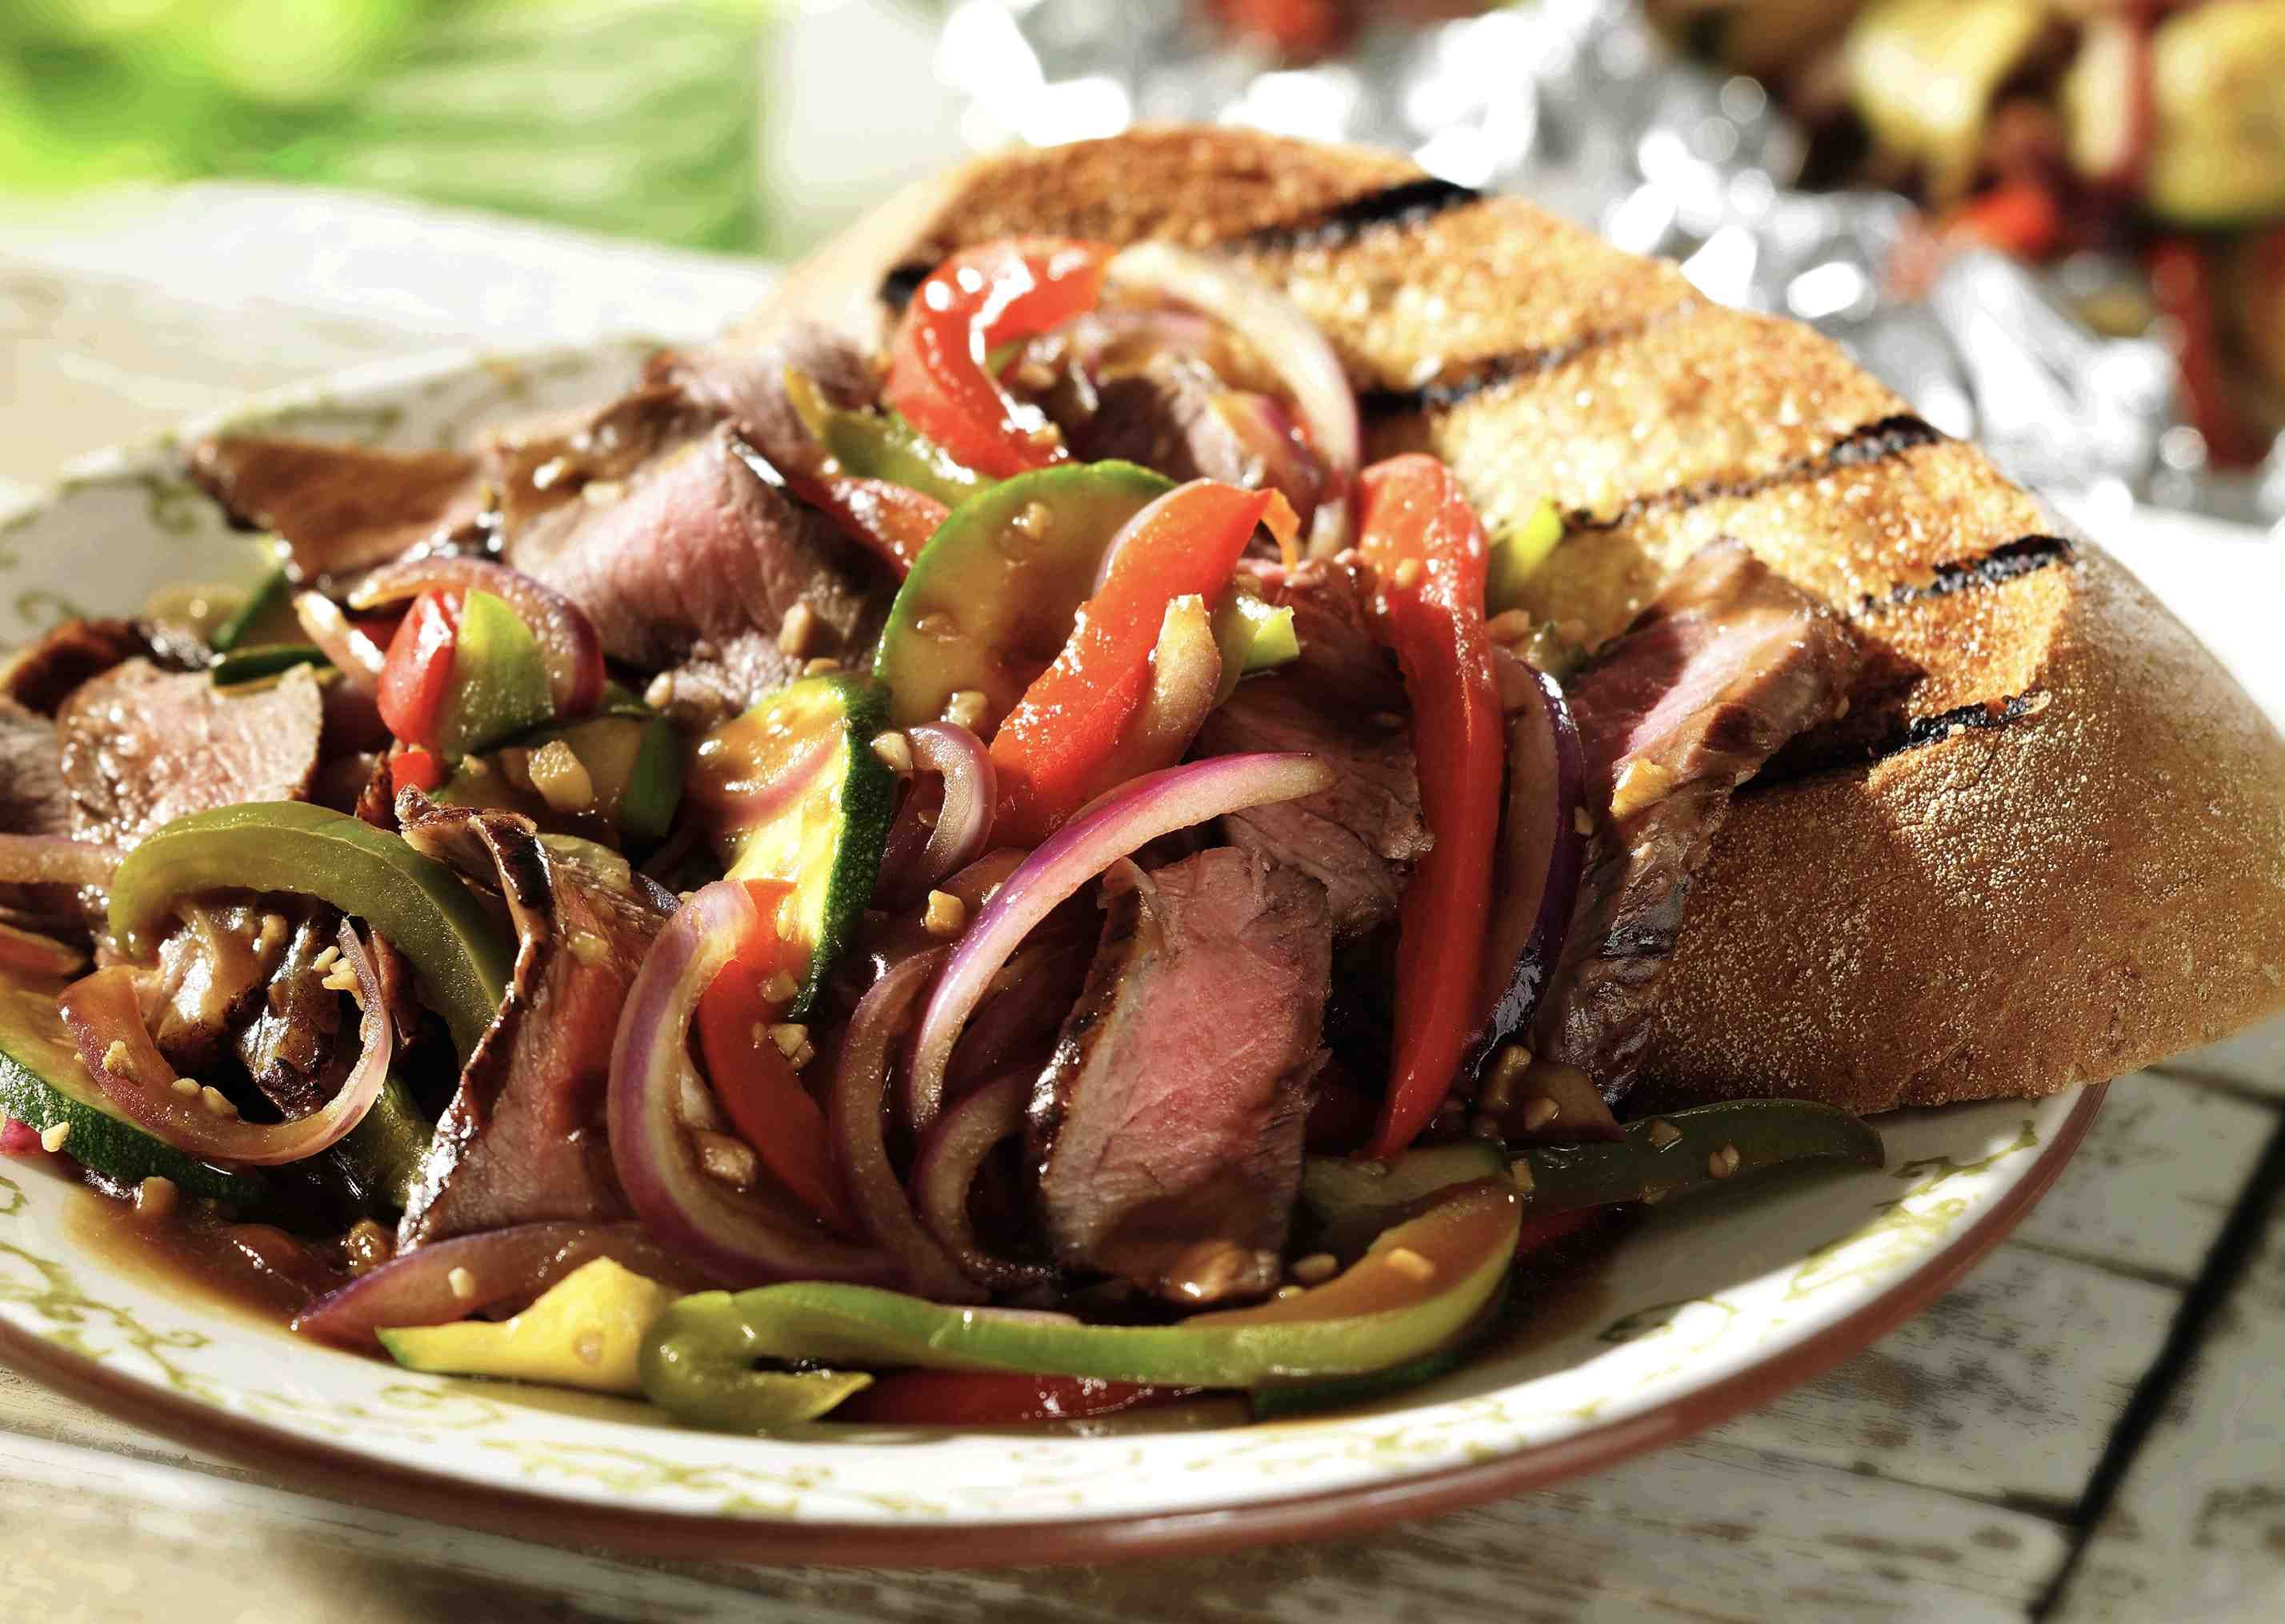 http://fooddaycanada.ca/recipes/barbecue-sirloin-stir-fry-2/